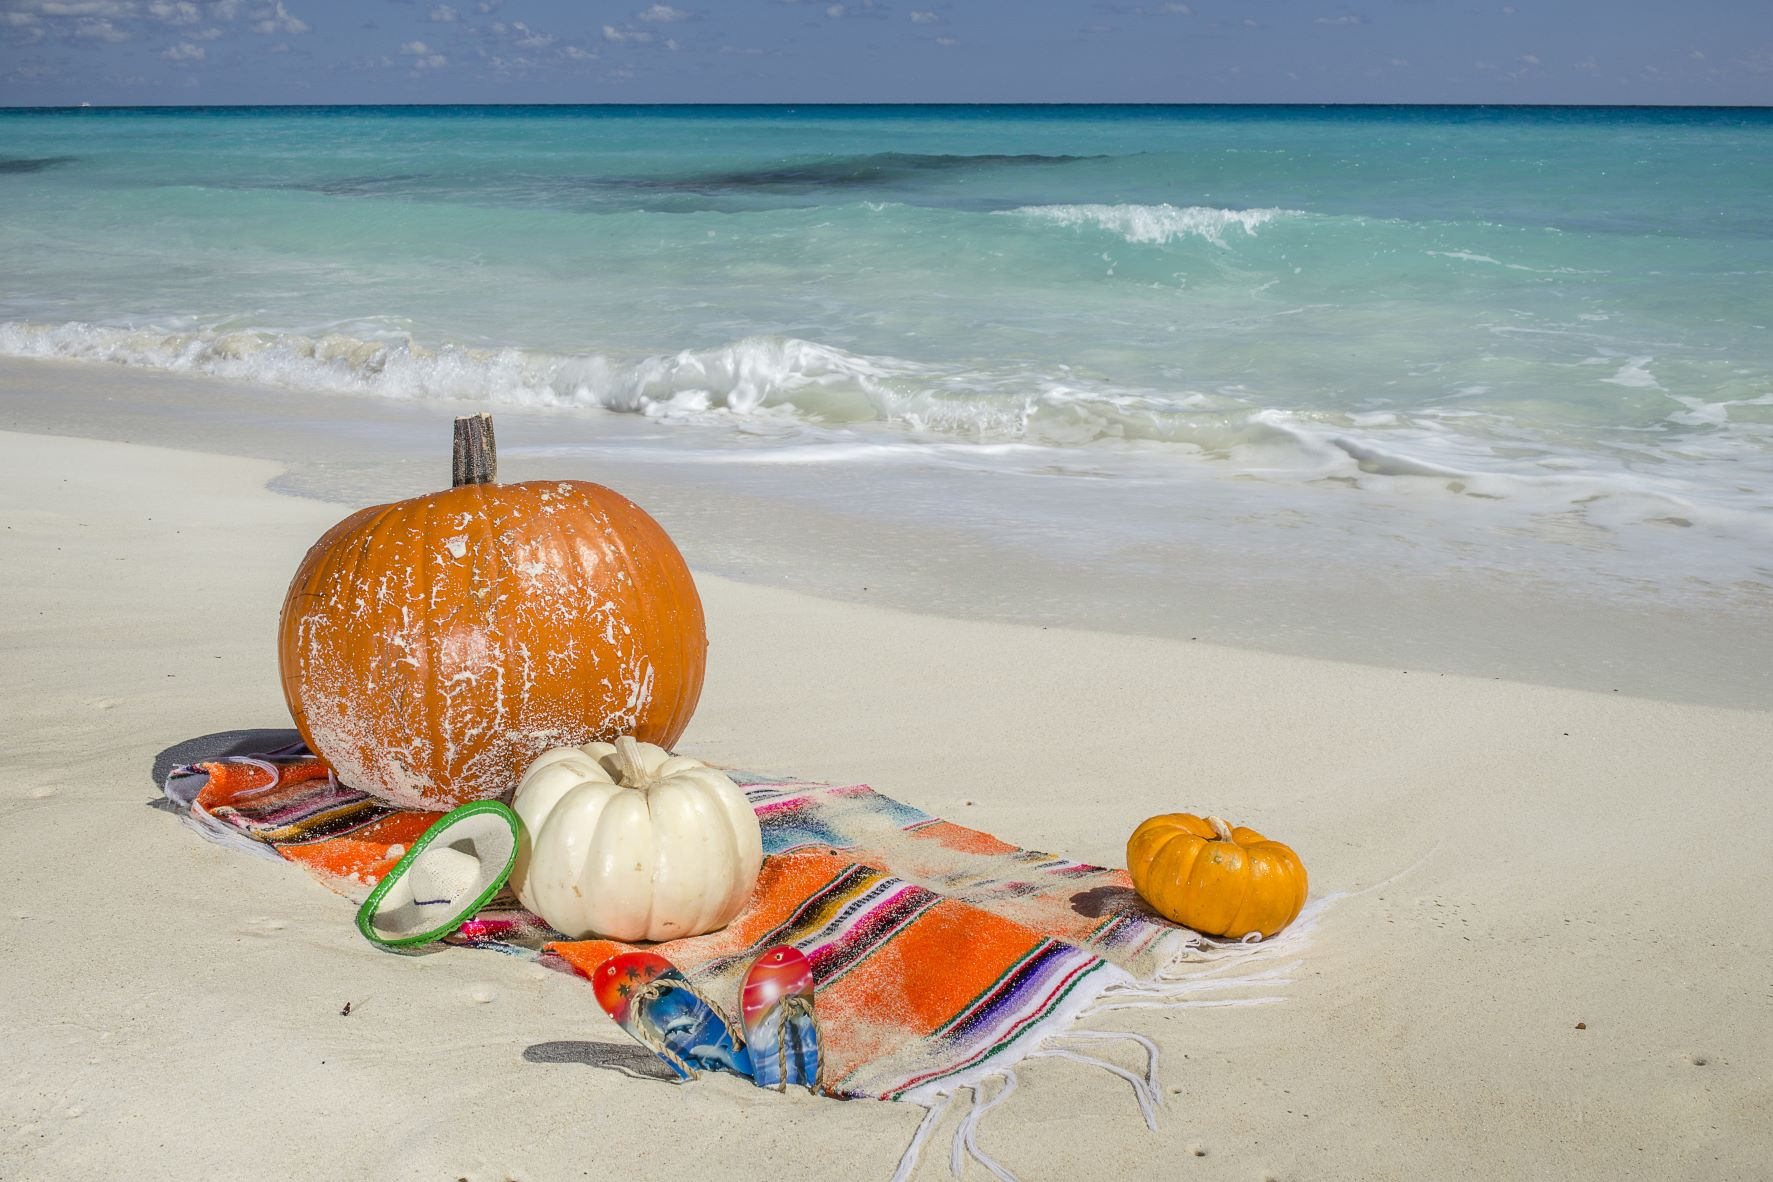 pumpkins on a towel on the beach